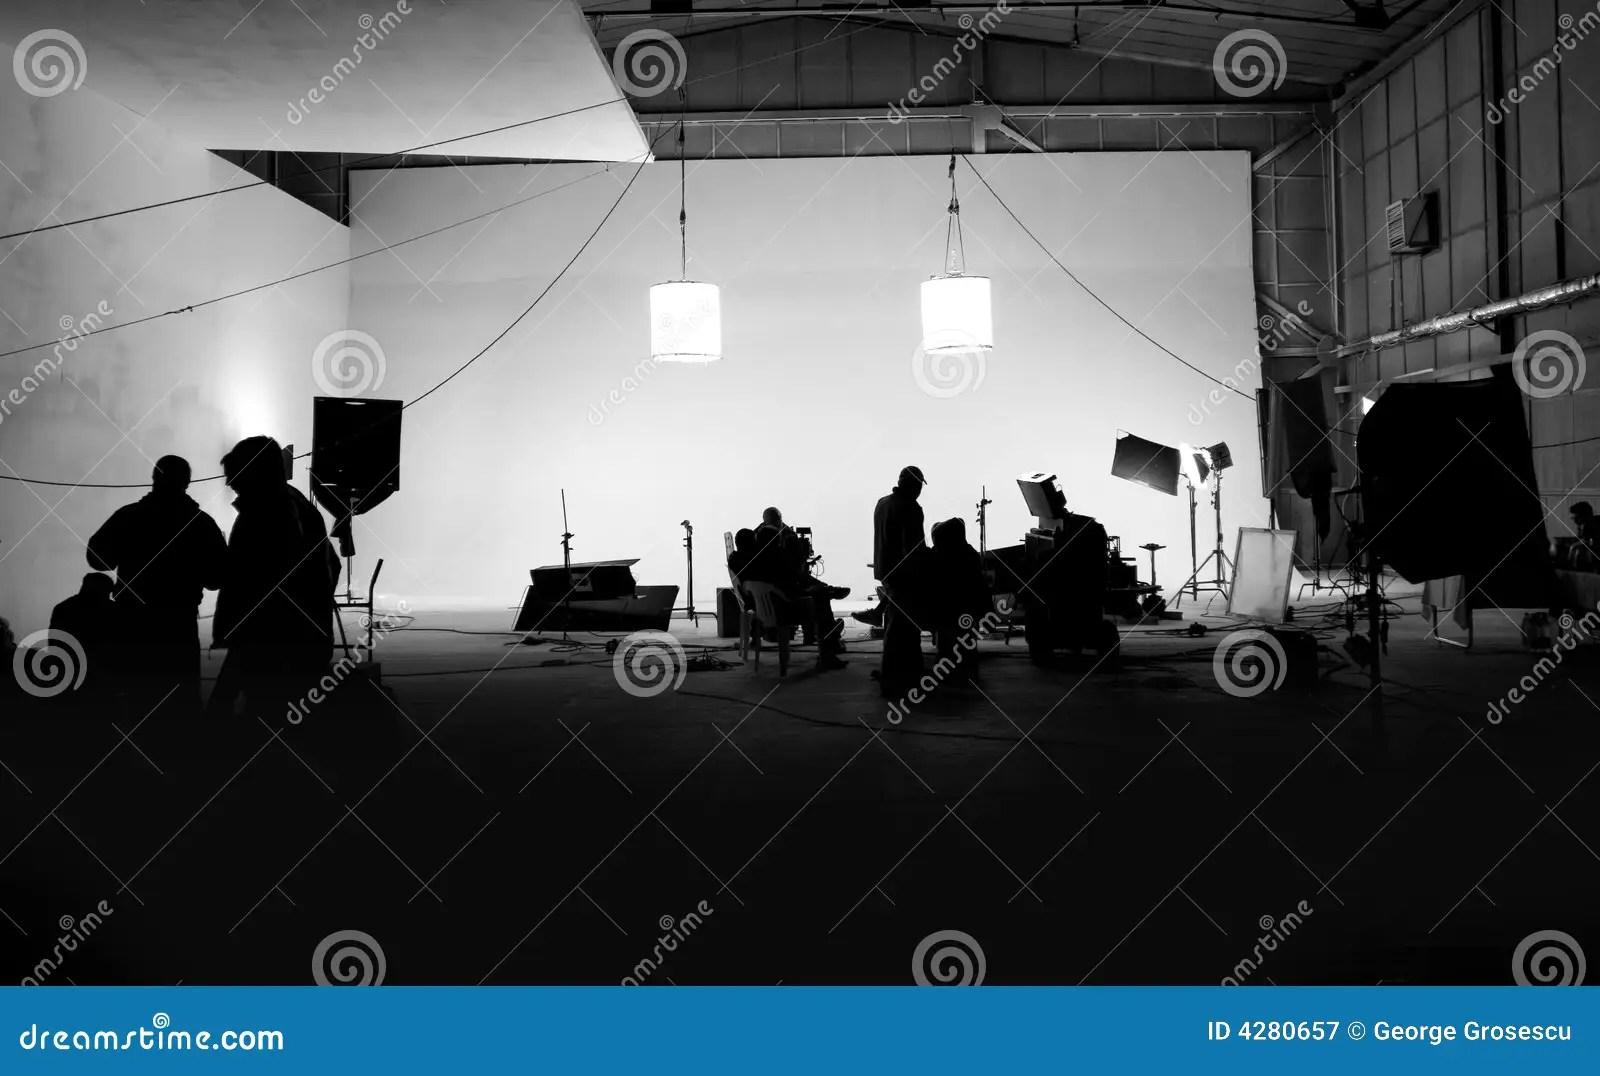 Studio Set Royalty Free Stock Photography  Image 4280657